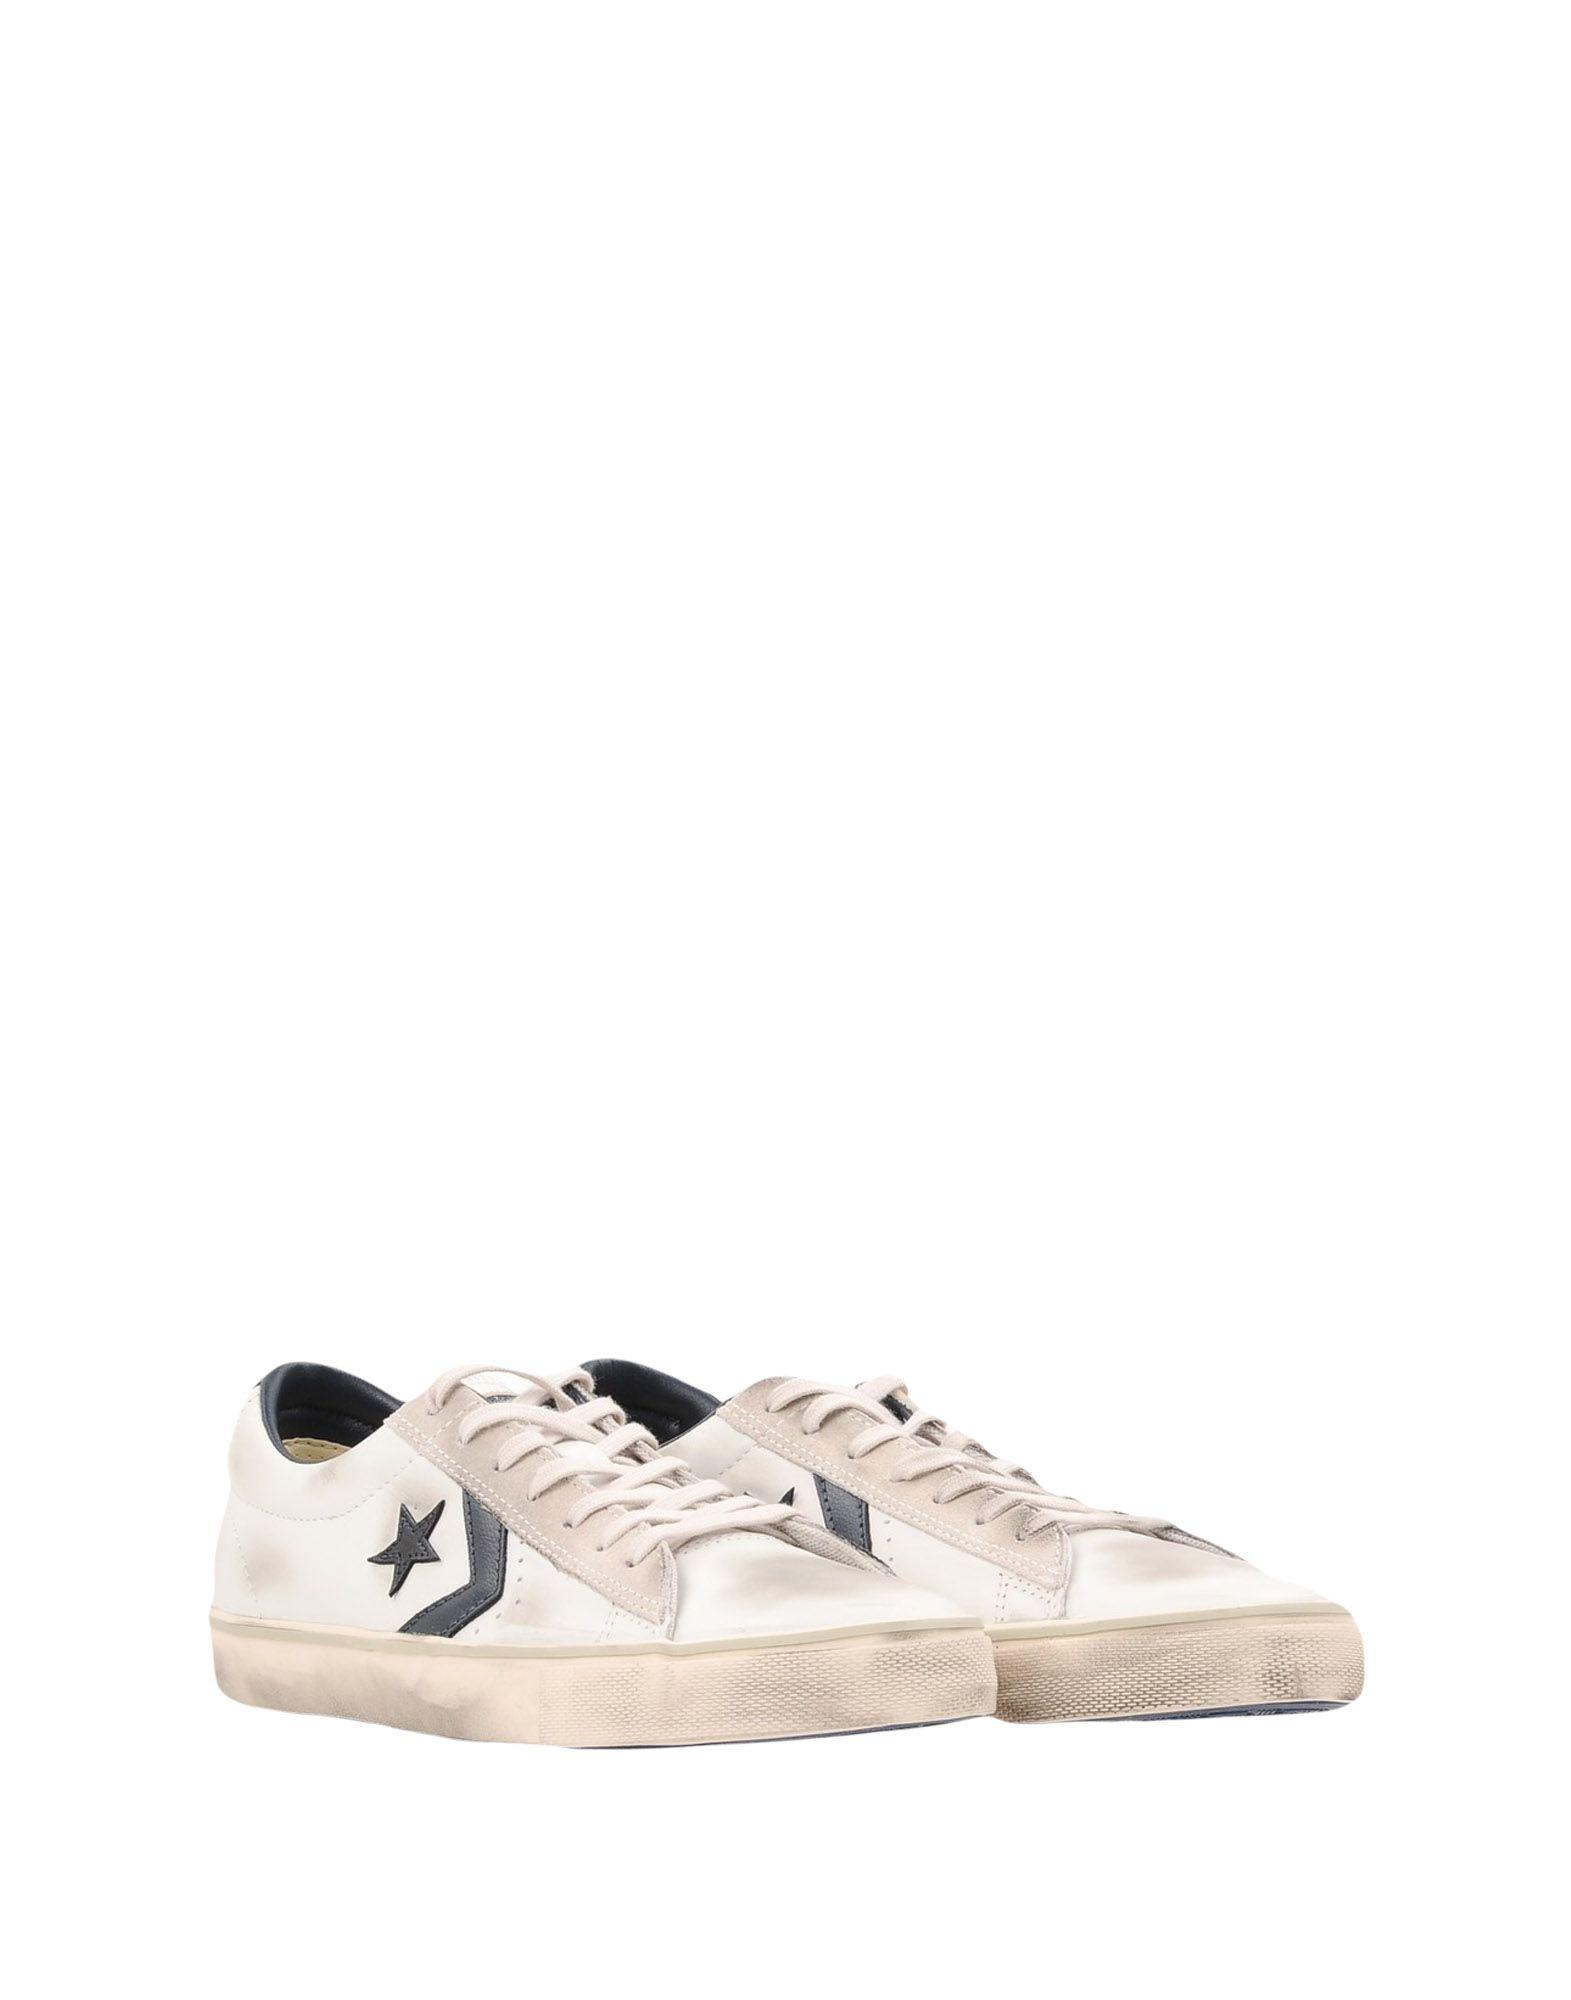 Converse Cons Pro Leather Vulc  Ox Leather Distressed  Vulc 11437504NV Heiße Schuhe c673c2